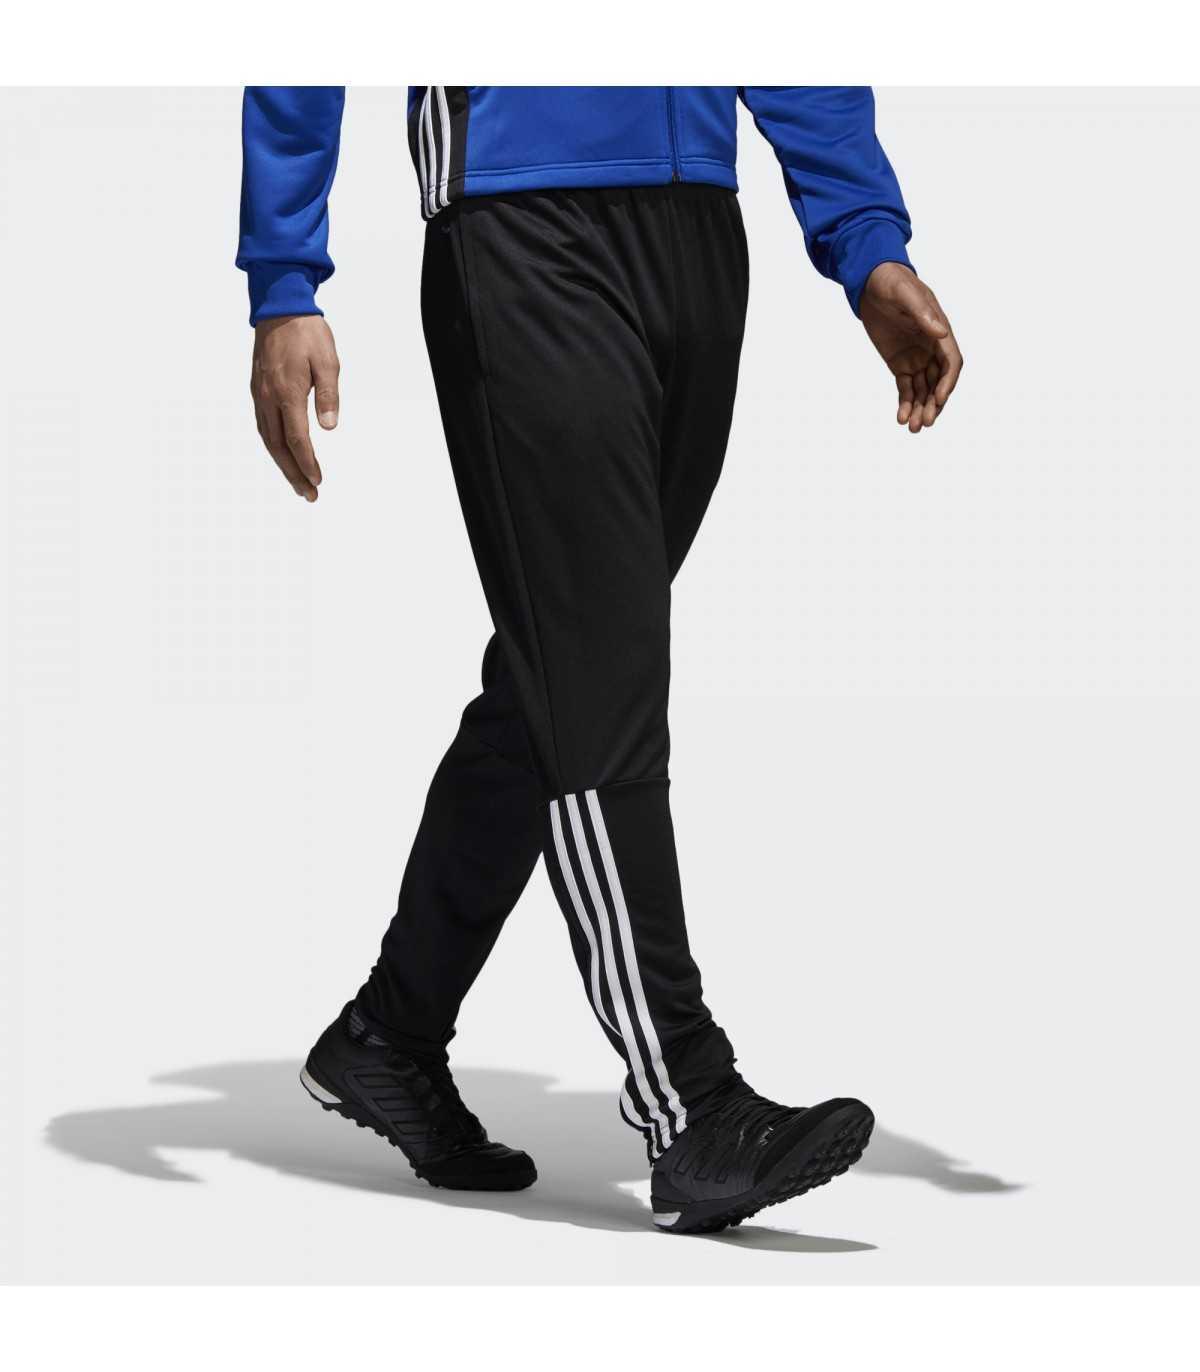 Adidas Szccqw Training Registra Pantalon Men 18 wPiTOXkZu